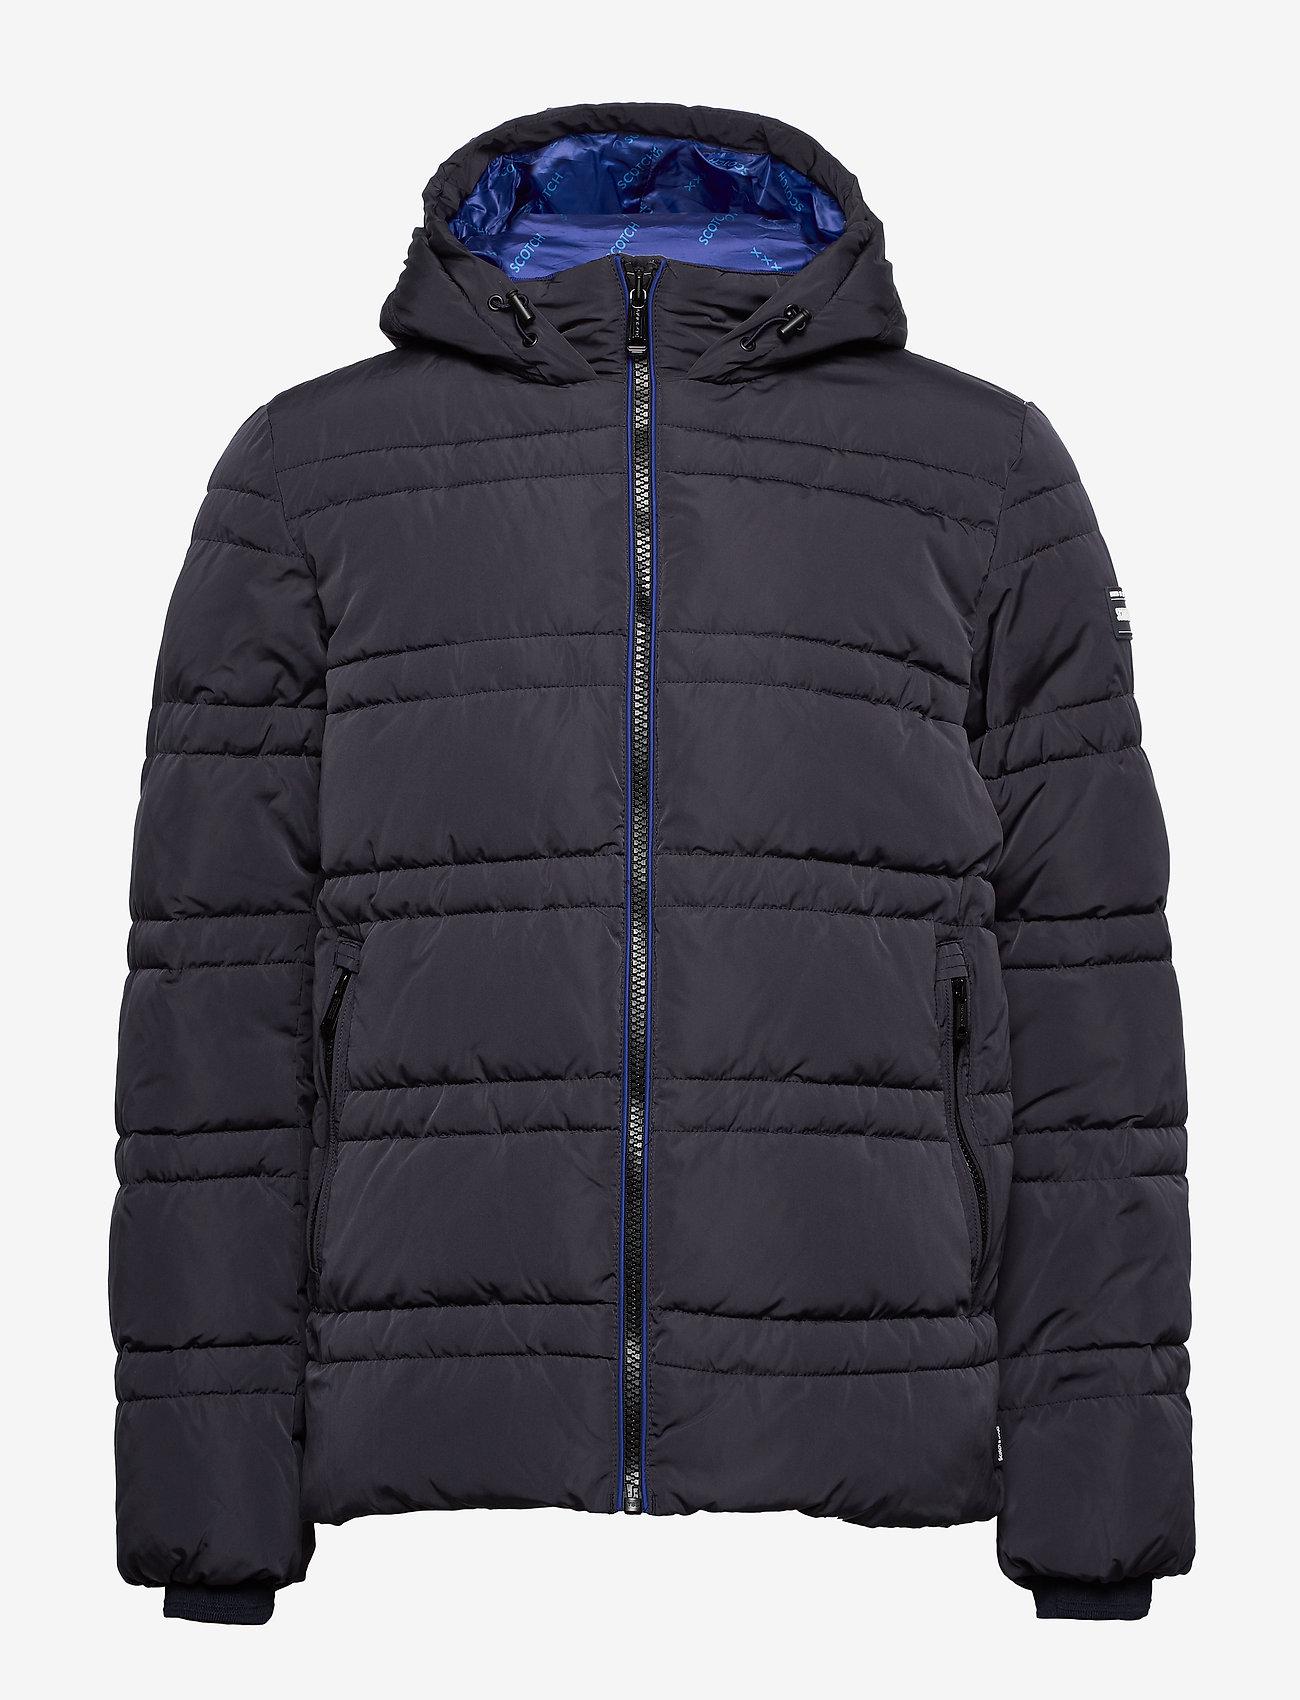 Scotch & Soda - Classic hooded PrimaLoft jacket - vestes matelassées - night - 1